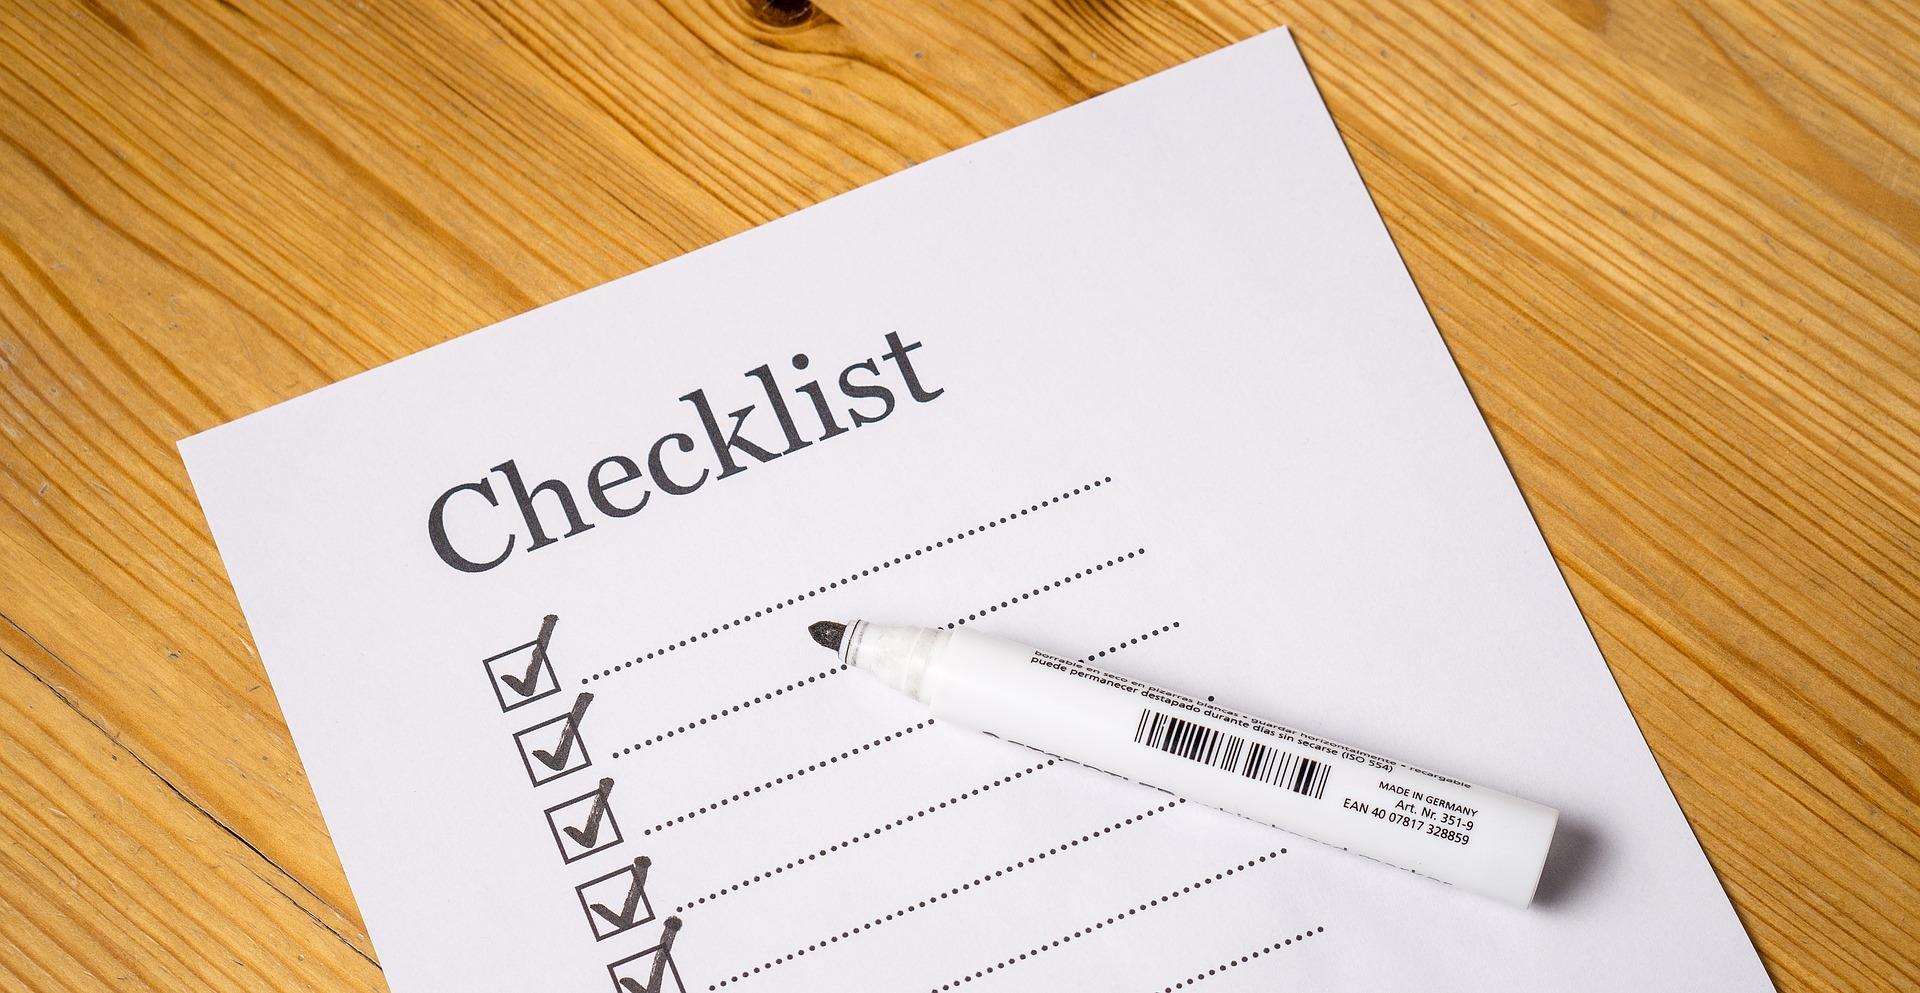 checklist 2077019